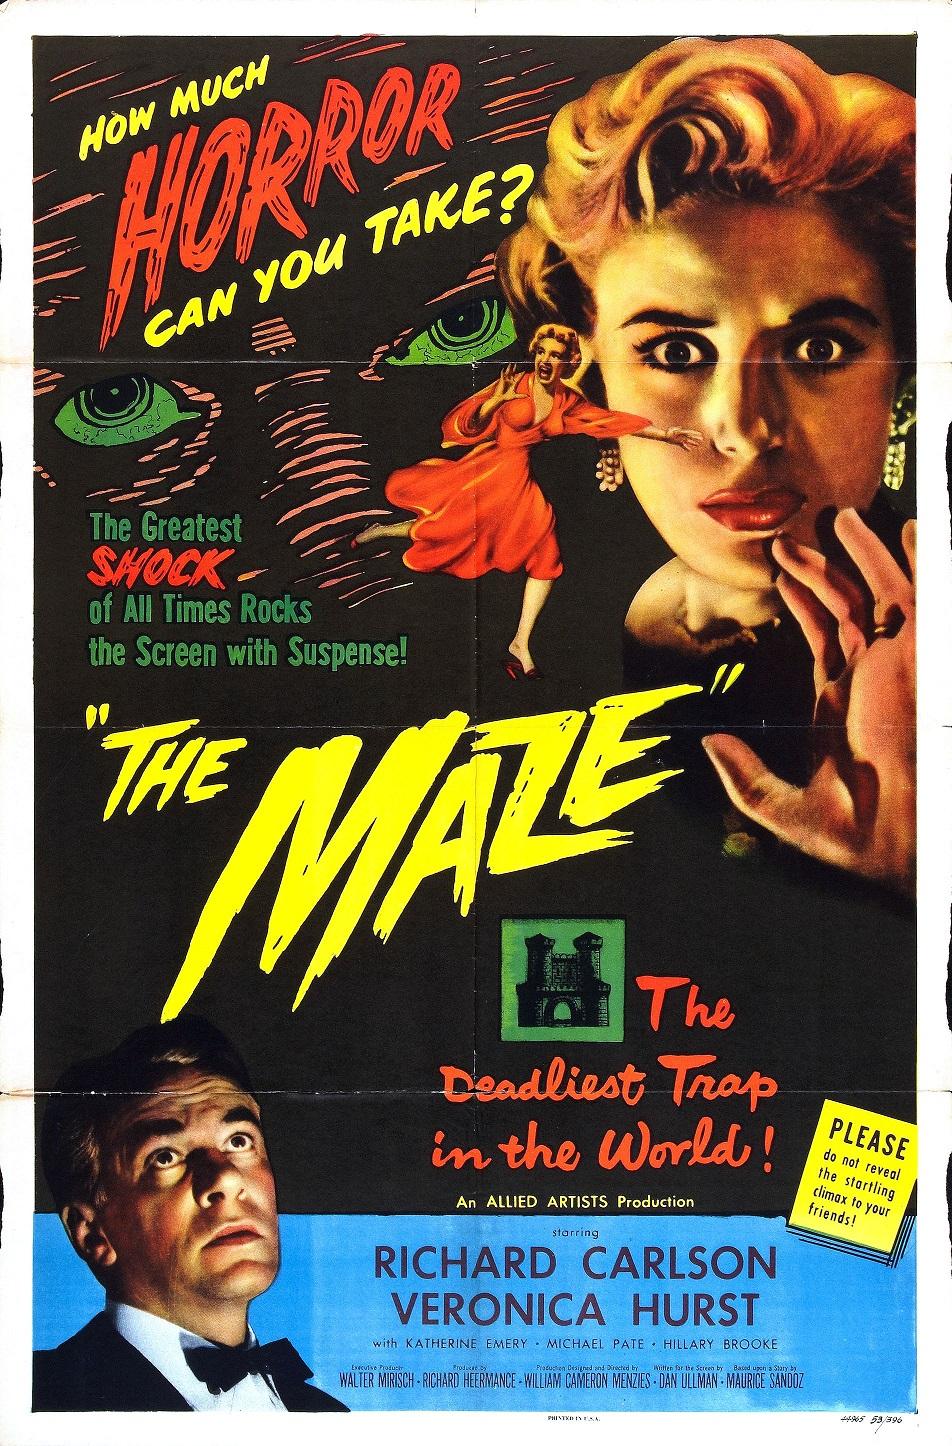 the-maze-1kite44the-maze-1the-maze-11the-maze-10the-maze-16